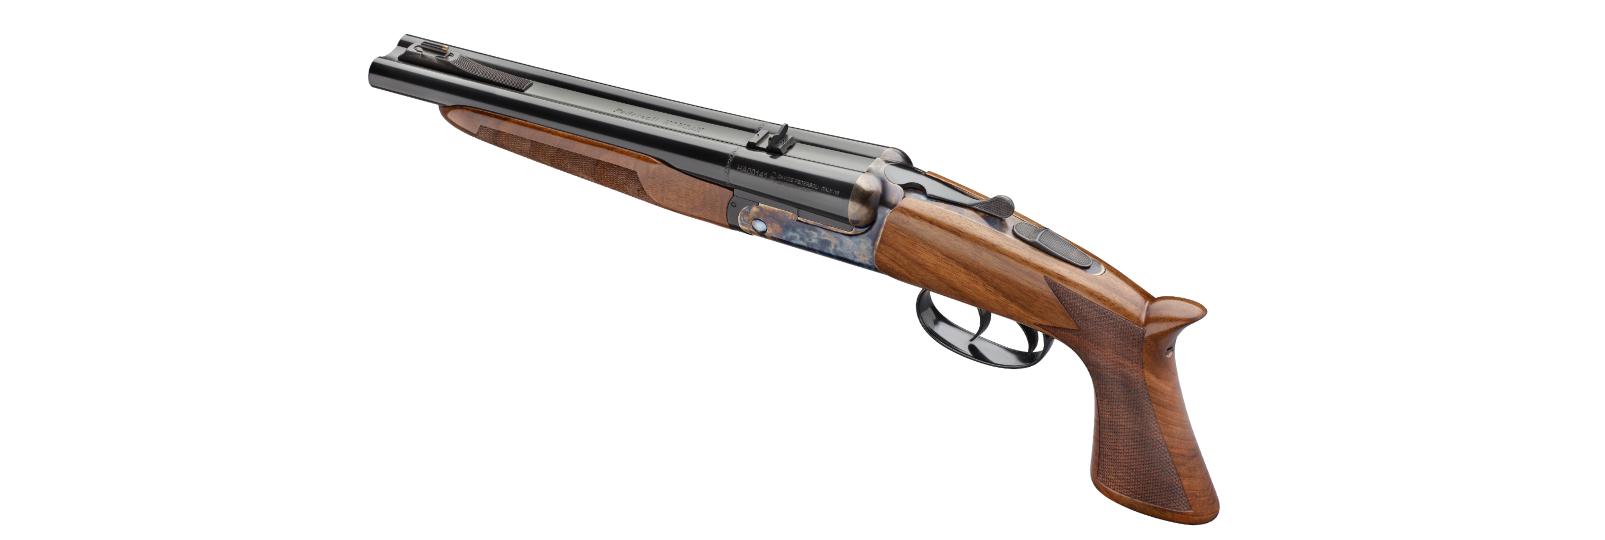 Pedersoli Howdah Pistol .45/410